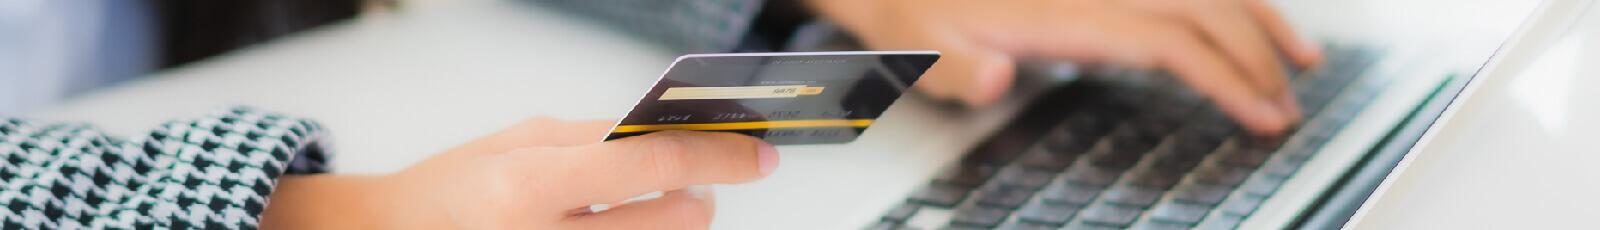 Test Credit Card Number Generator Validator For Payment Gateway Developers Weblineindia